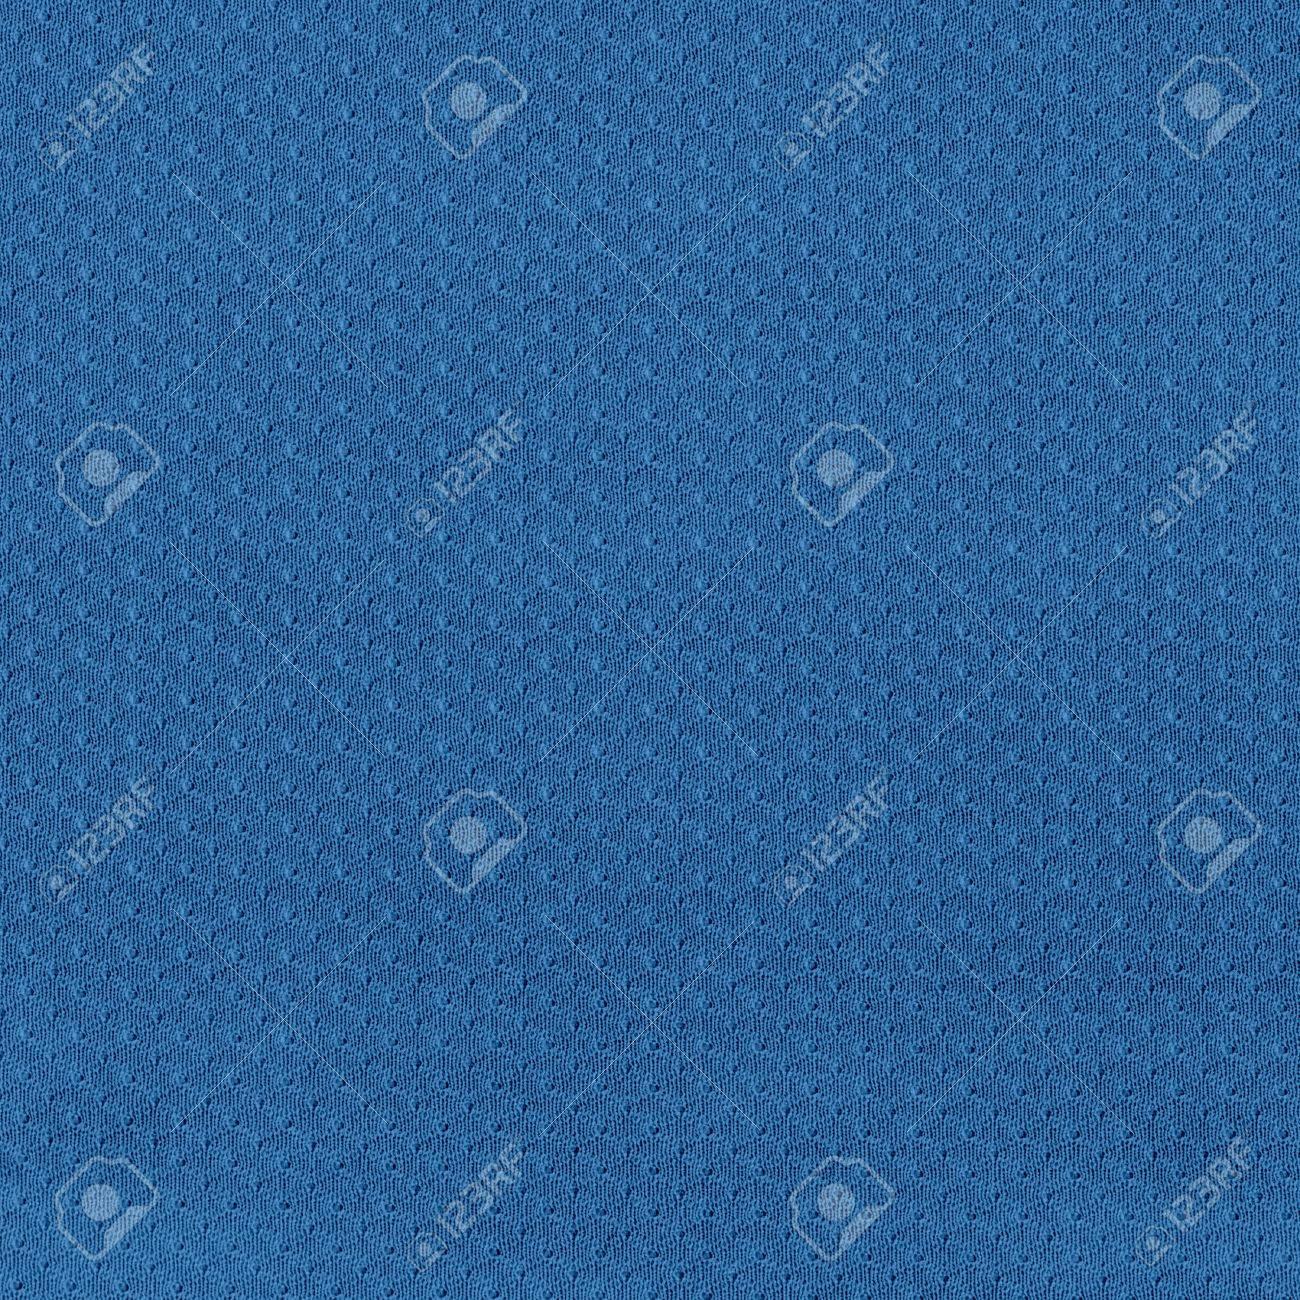 Blue Sport Jersey Mesh Textile Stock Photo - 16707940